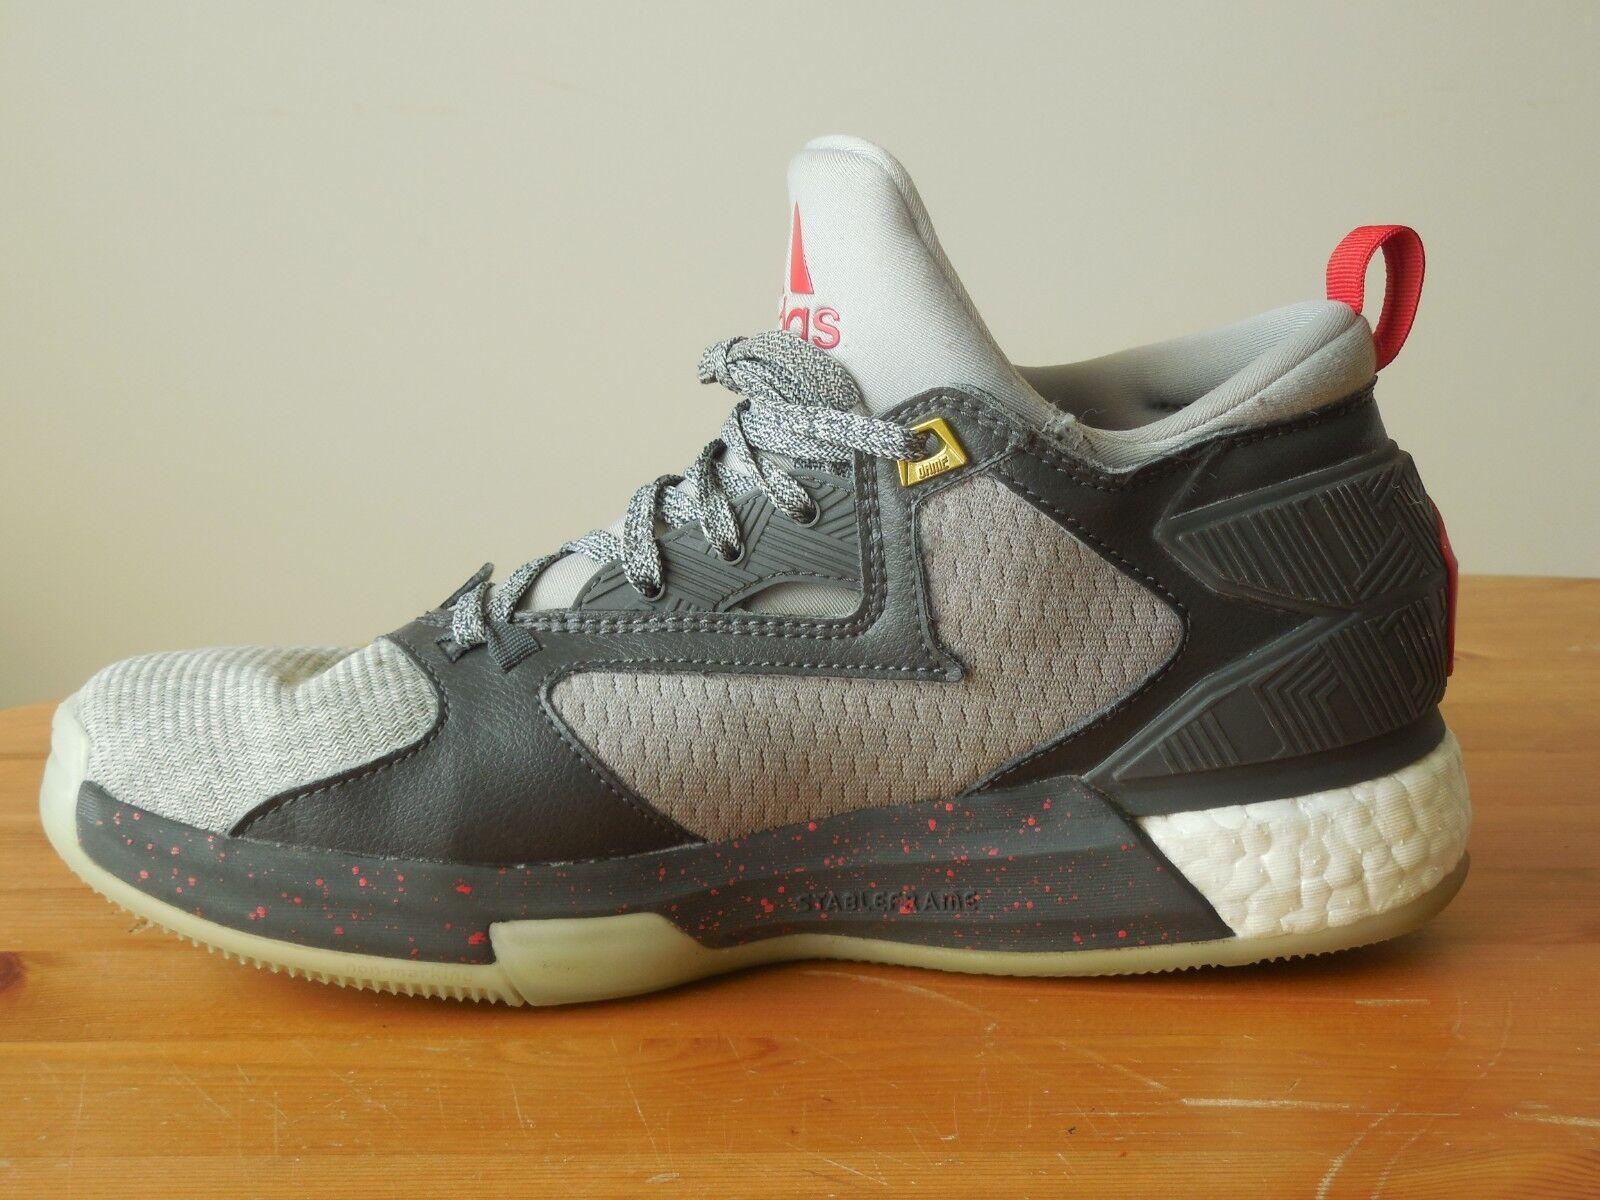 Adidas damian lillard lillard lillard 2 förderung aq7413 dame ist basketball - schuhe für männer größe 6,5 5a6ebd